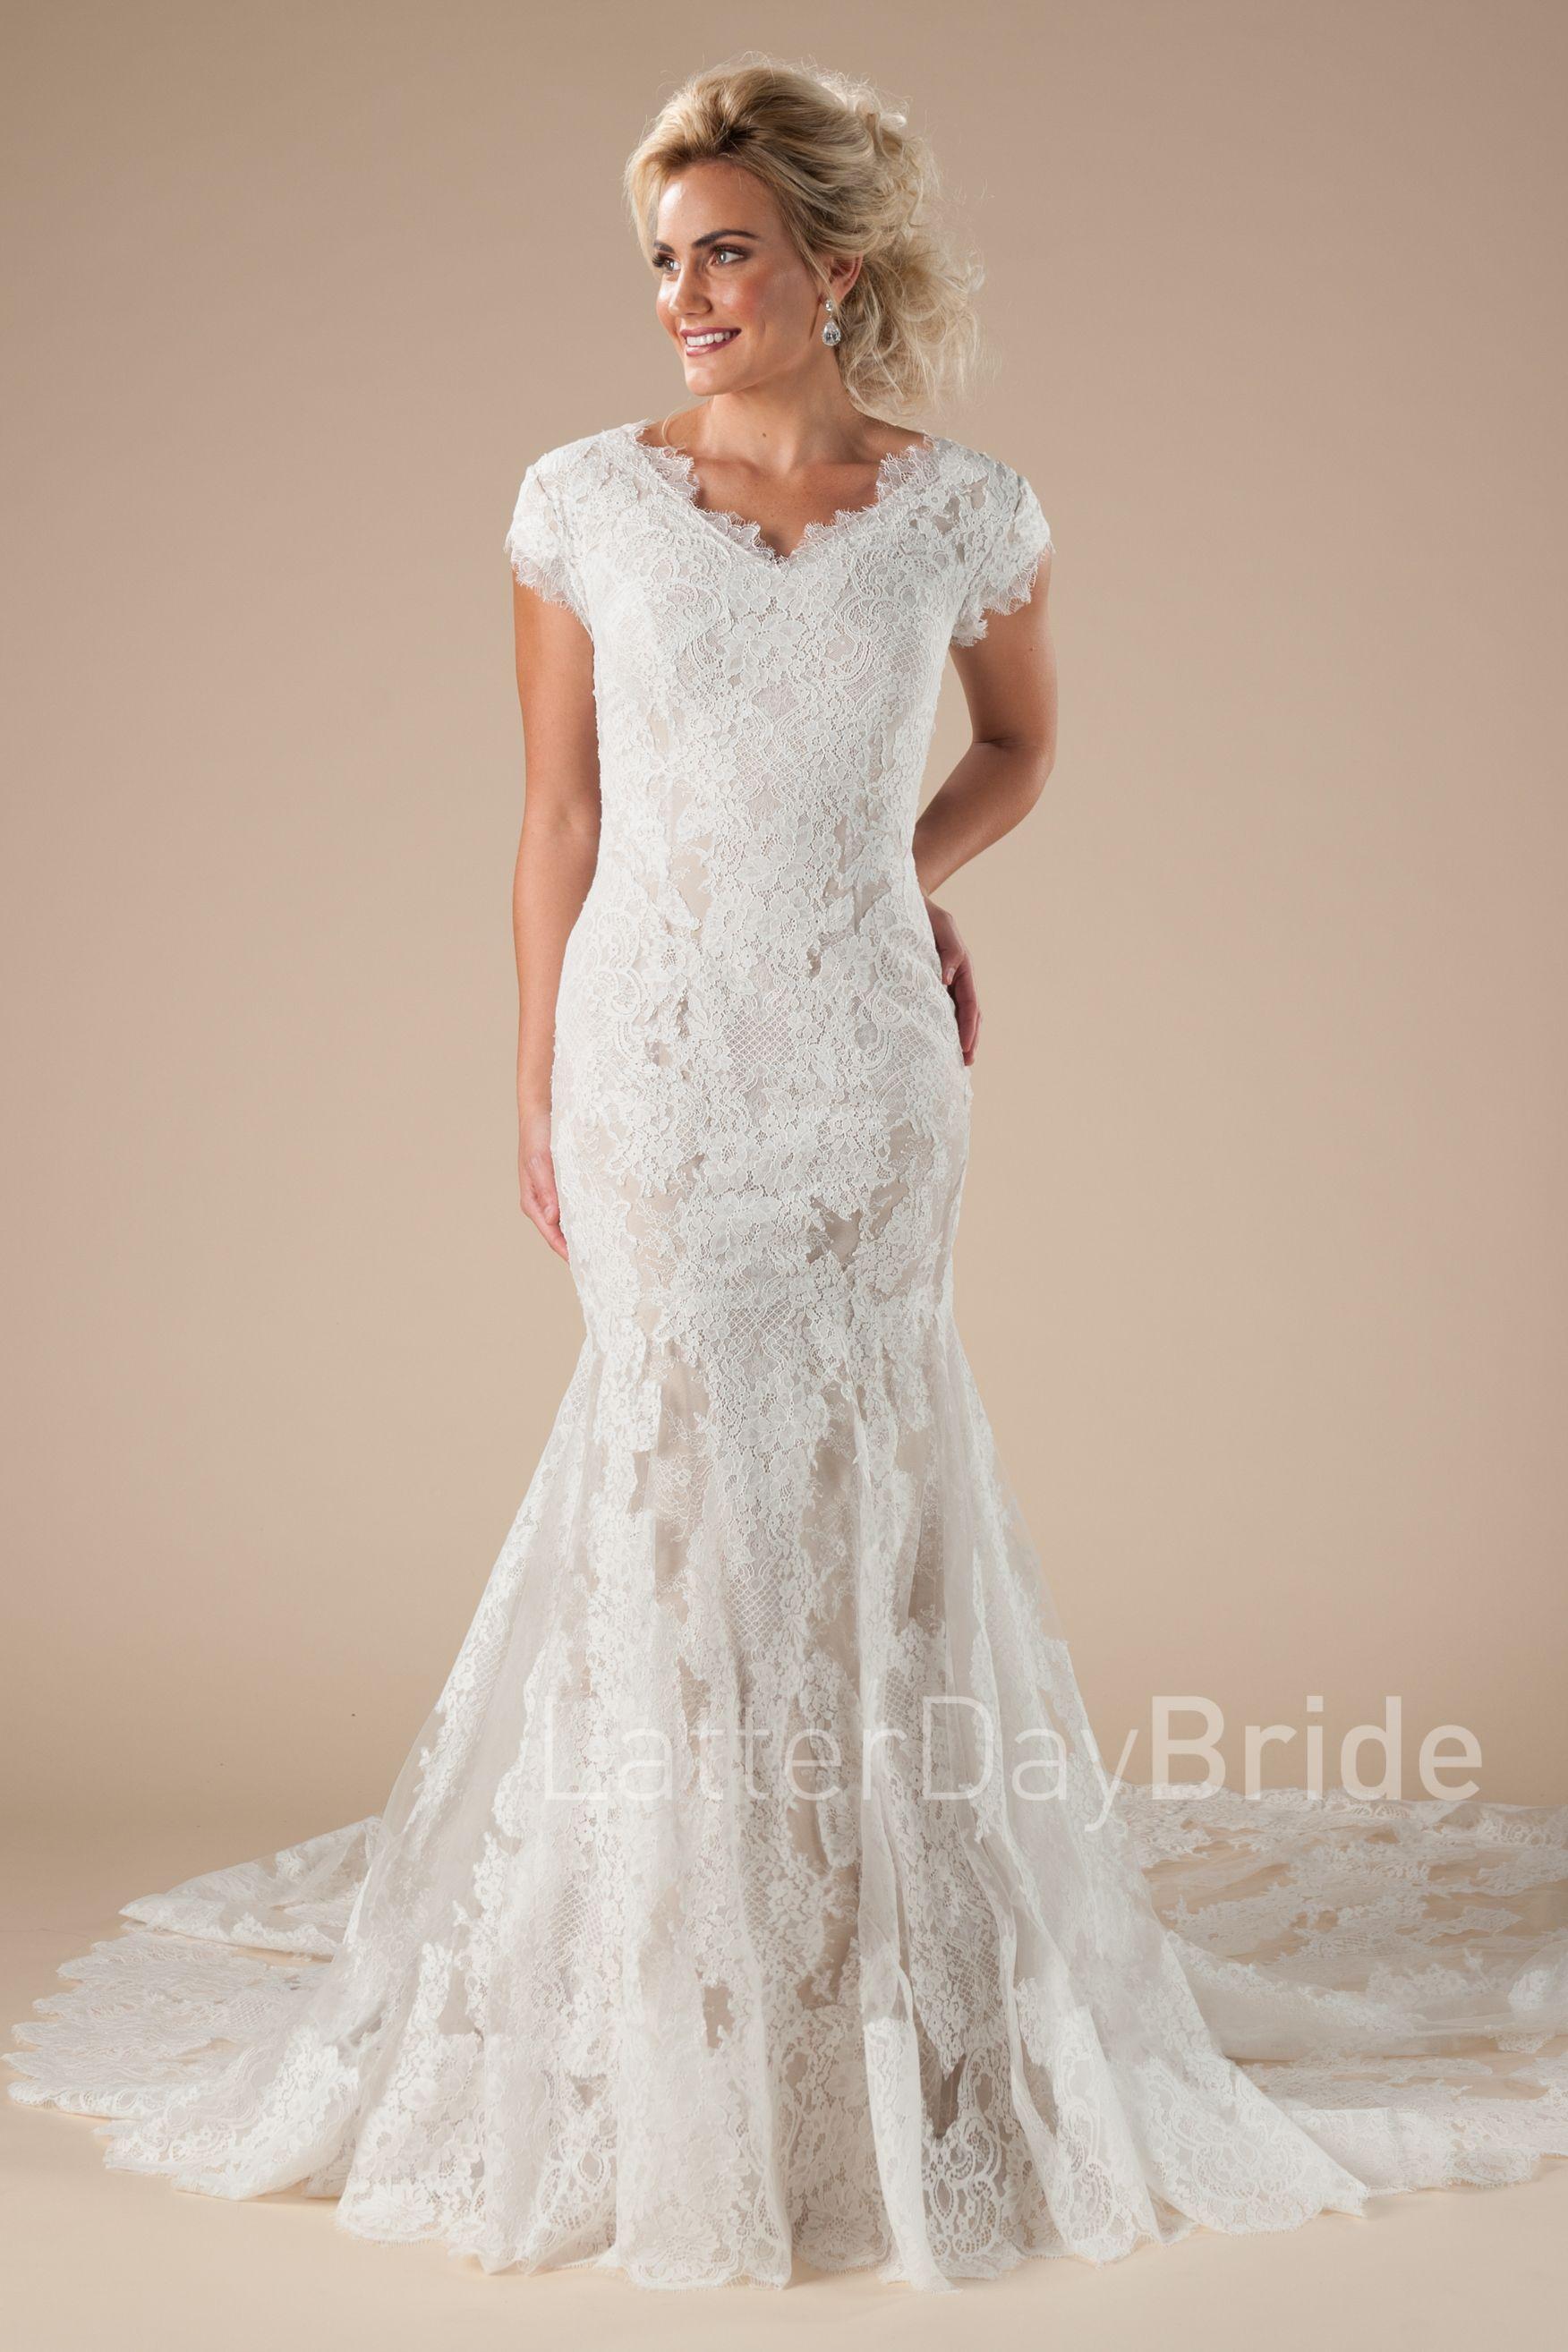 30 Modest Wedding Dresses Wedding dresses